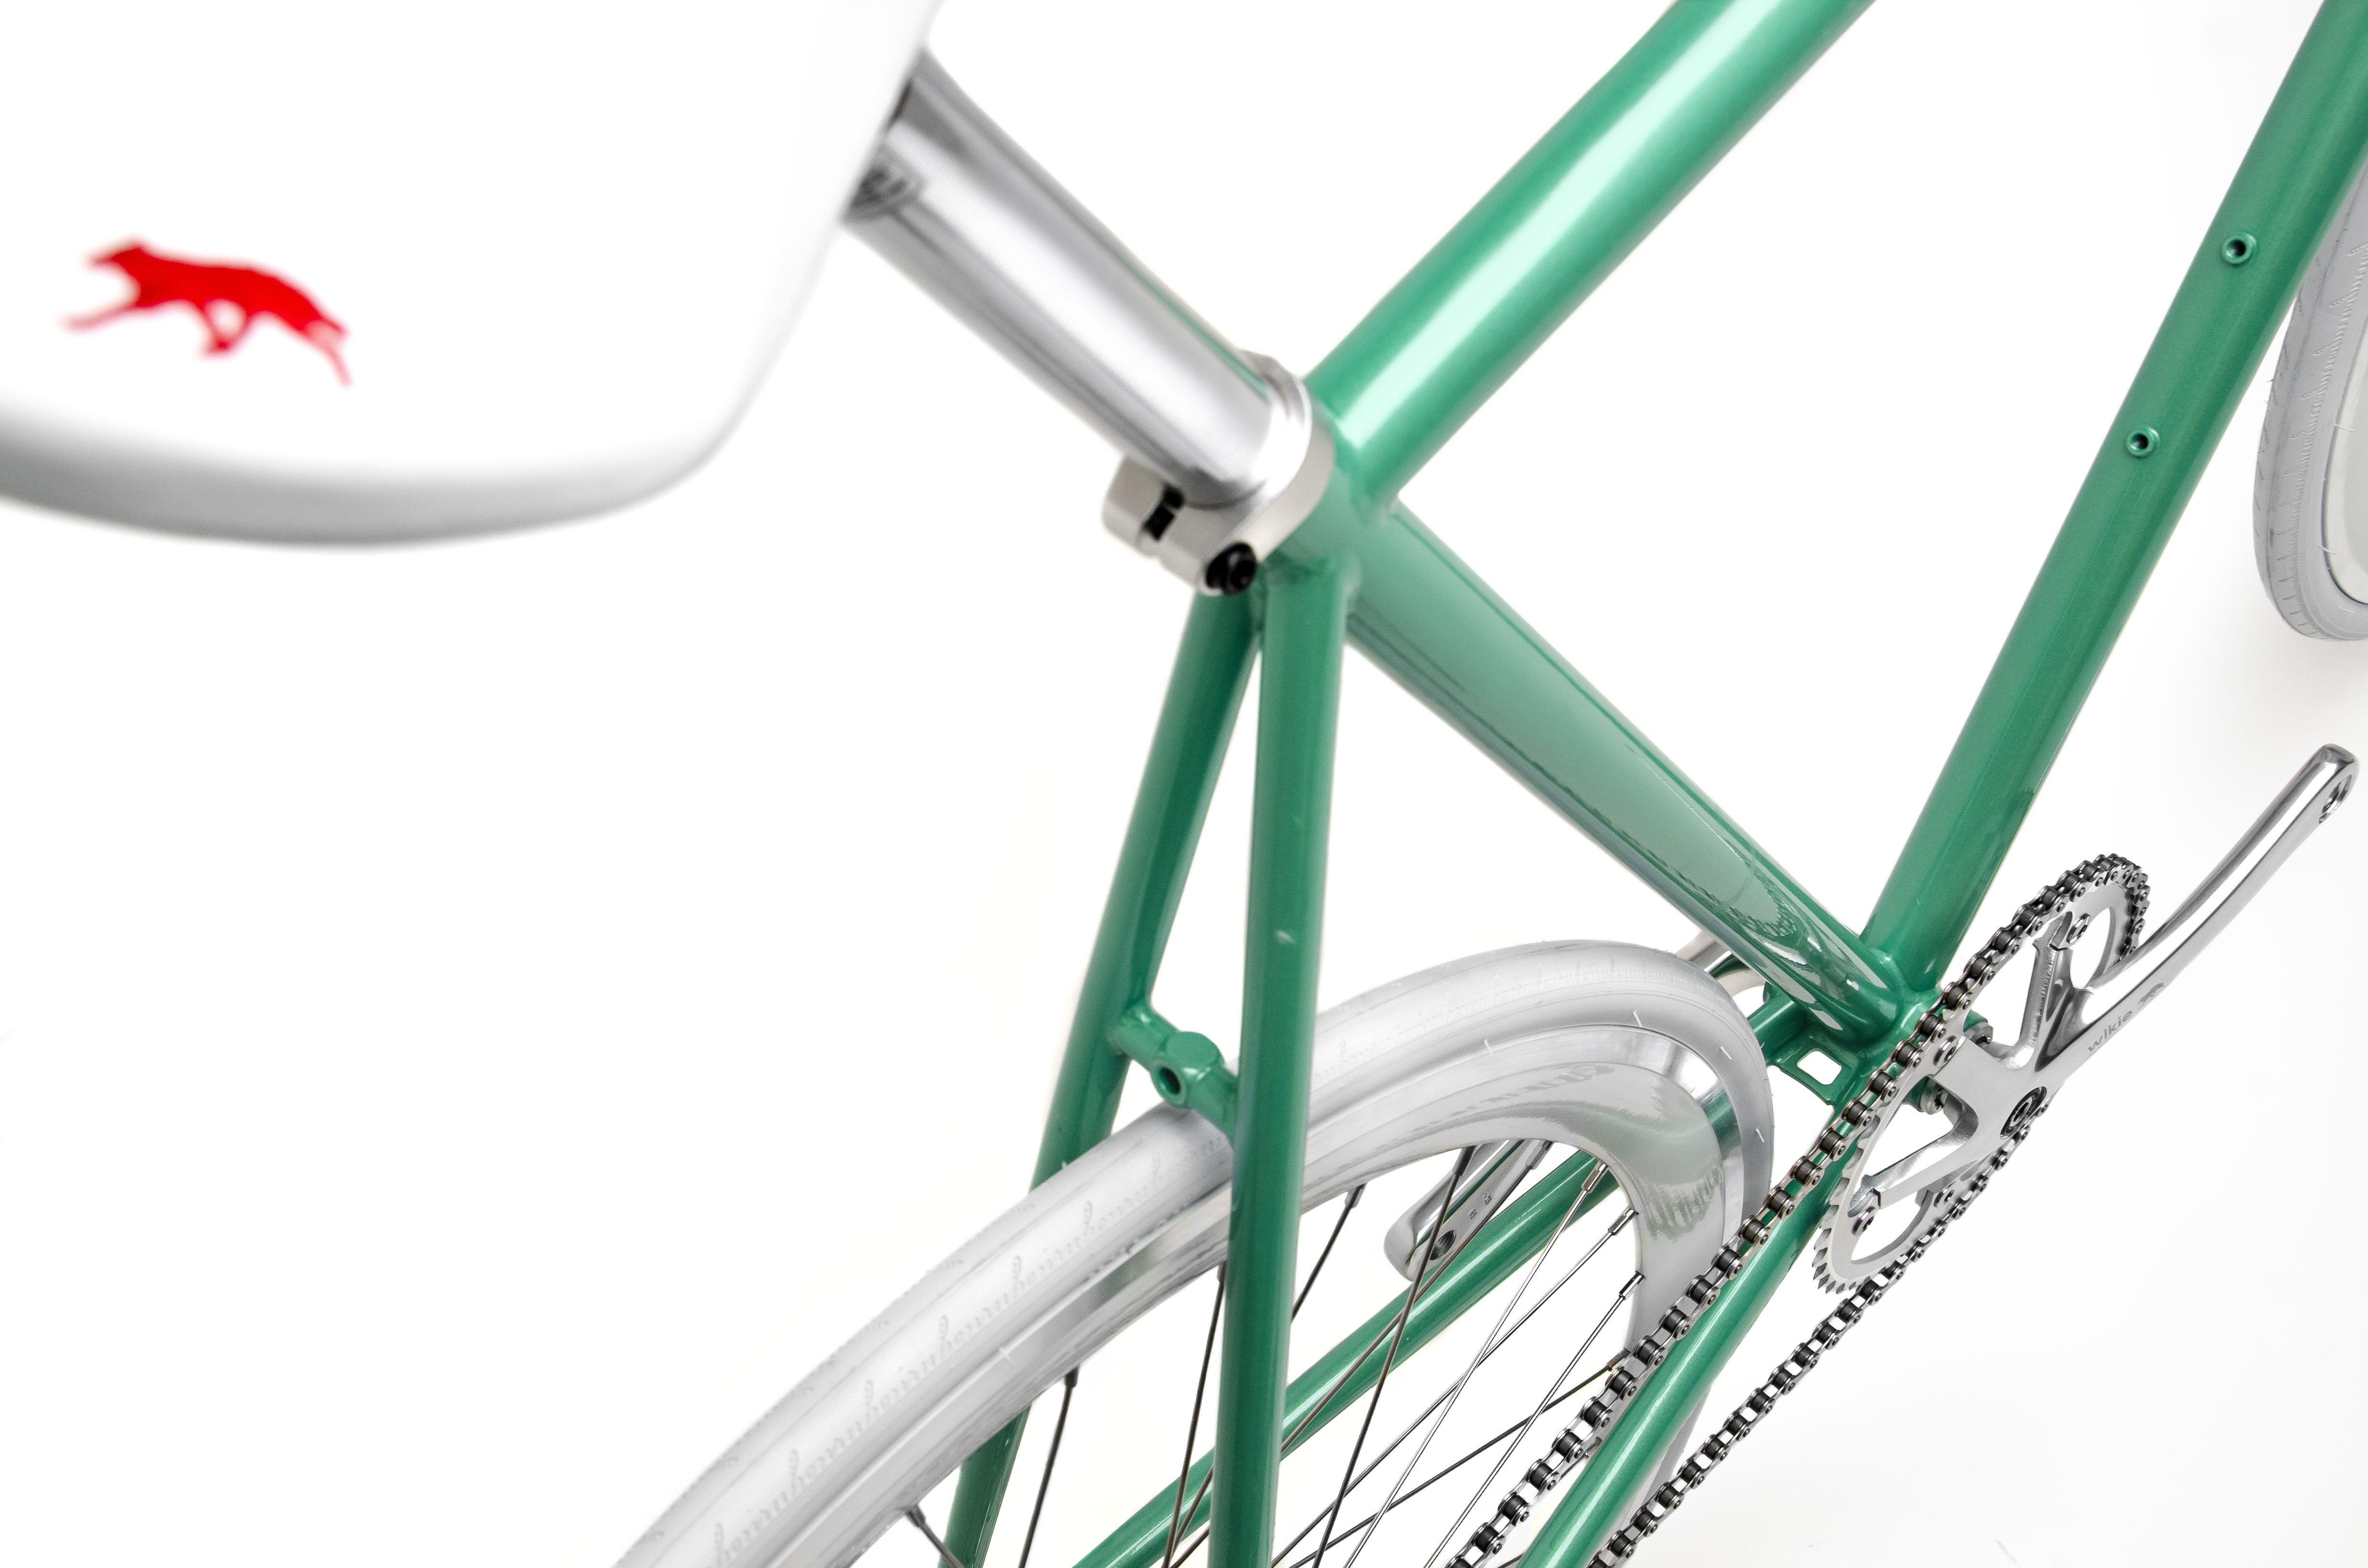 Mojito From 429 Fixed Gear Single Speed Fixie Urban Road Bike